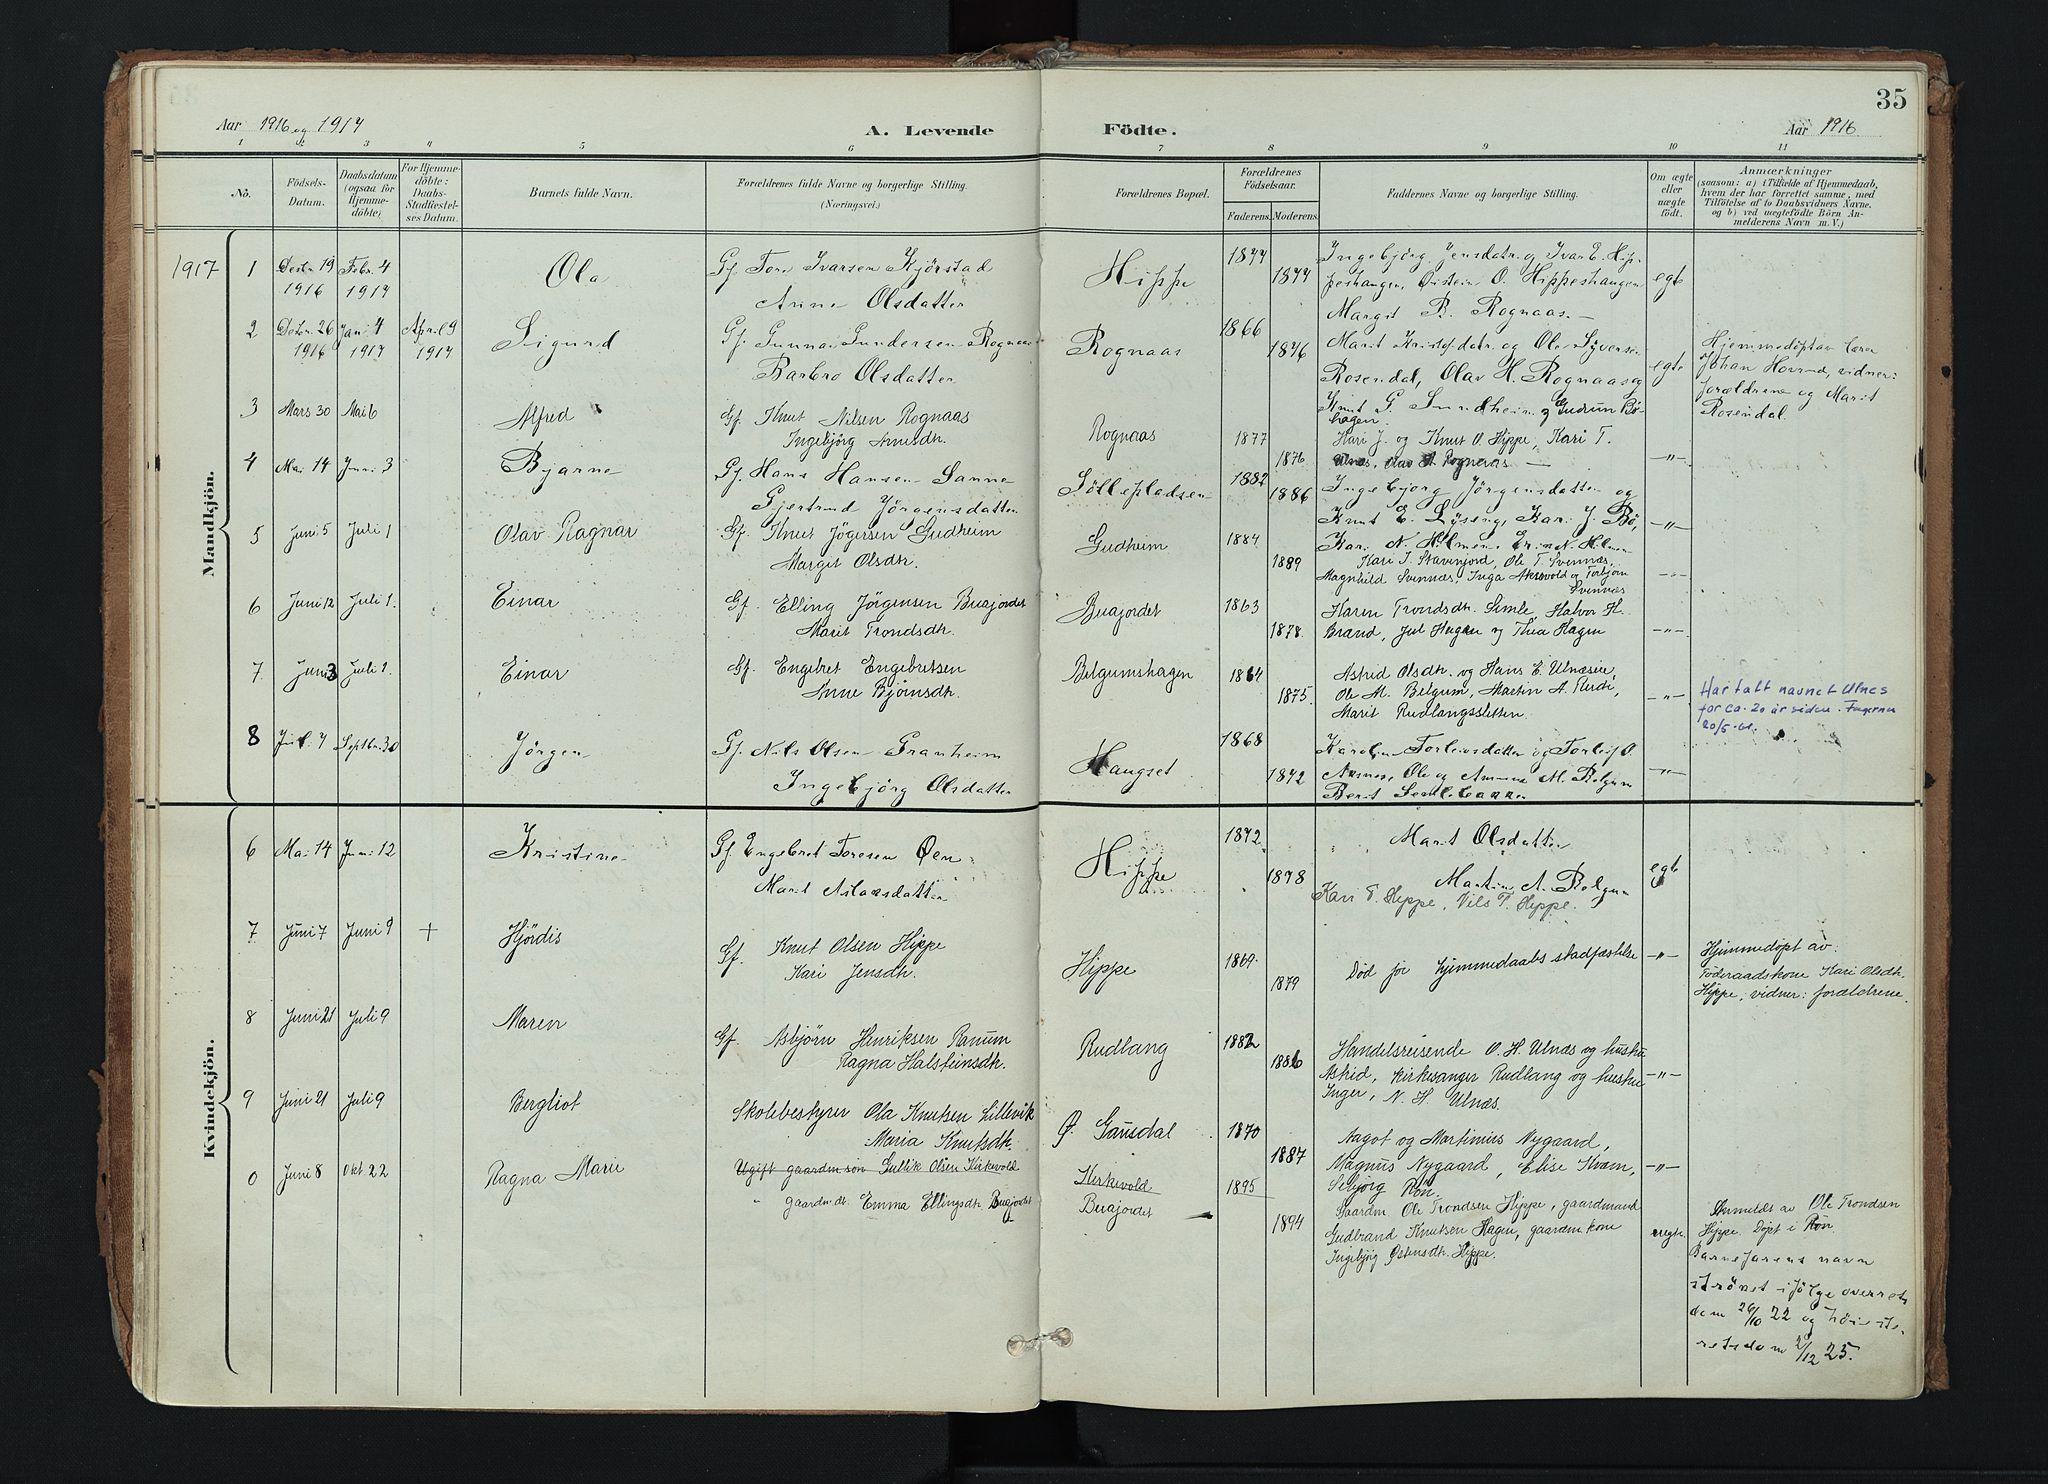 SAH, Nord-Aurdal prestekontor, Ministerialbok nr. 17, 1897-1926, s. 35